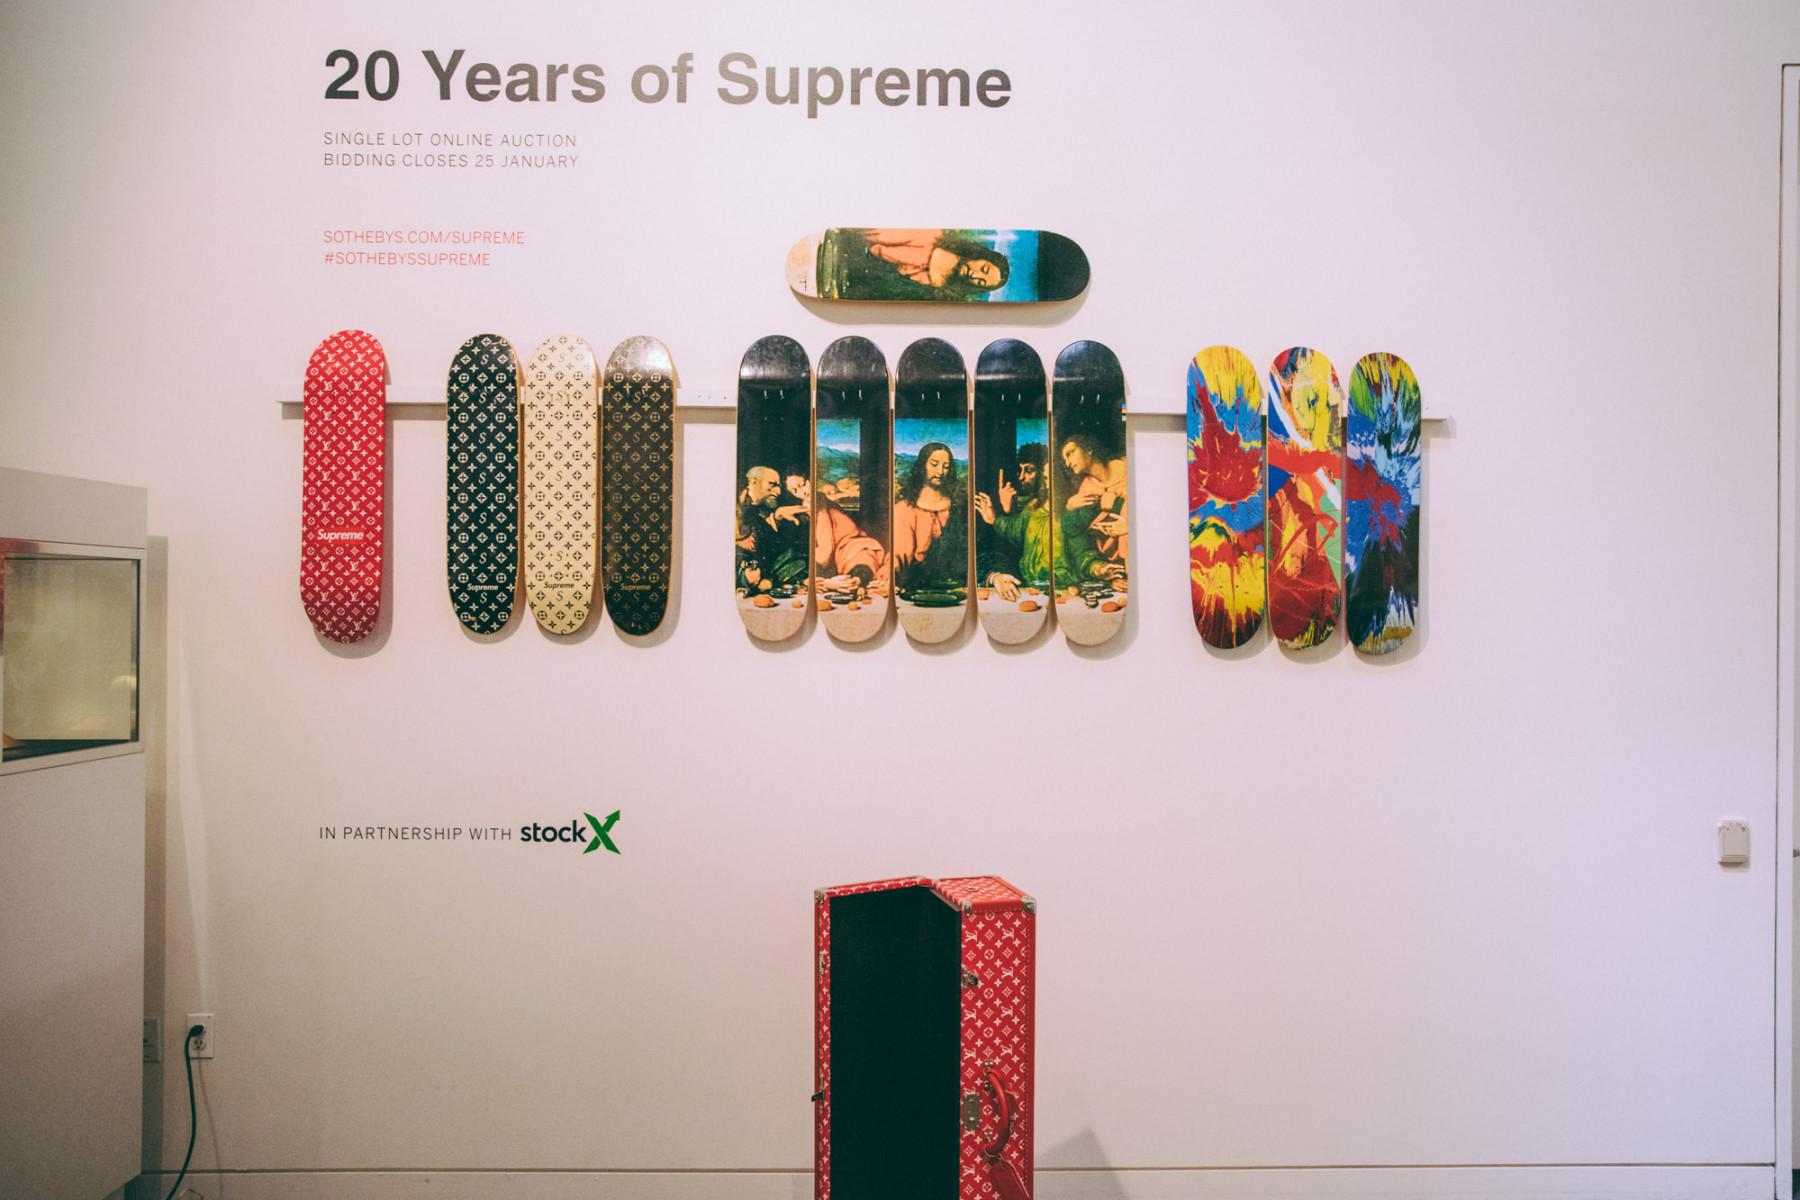 Sothebys-Supreme-Skate-Decks-11-1800x1200